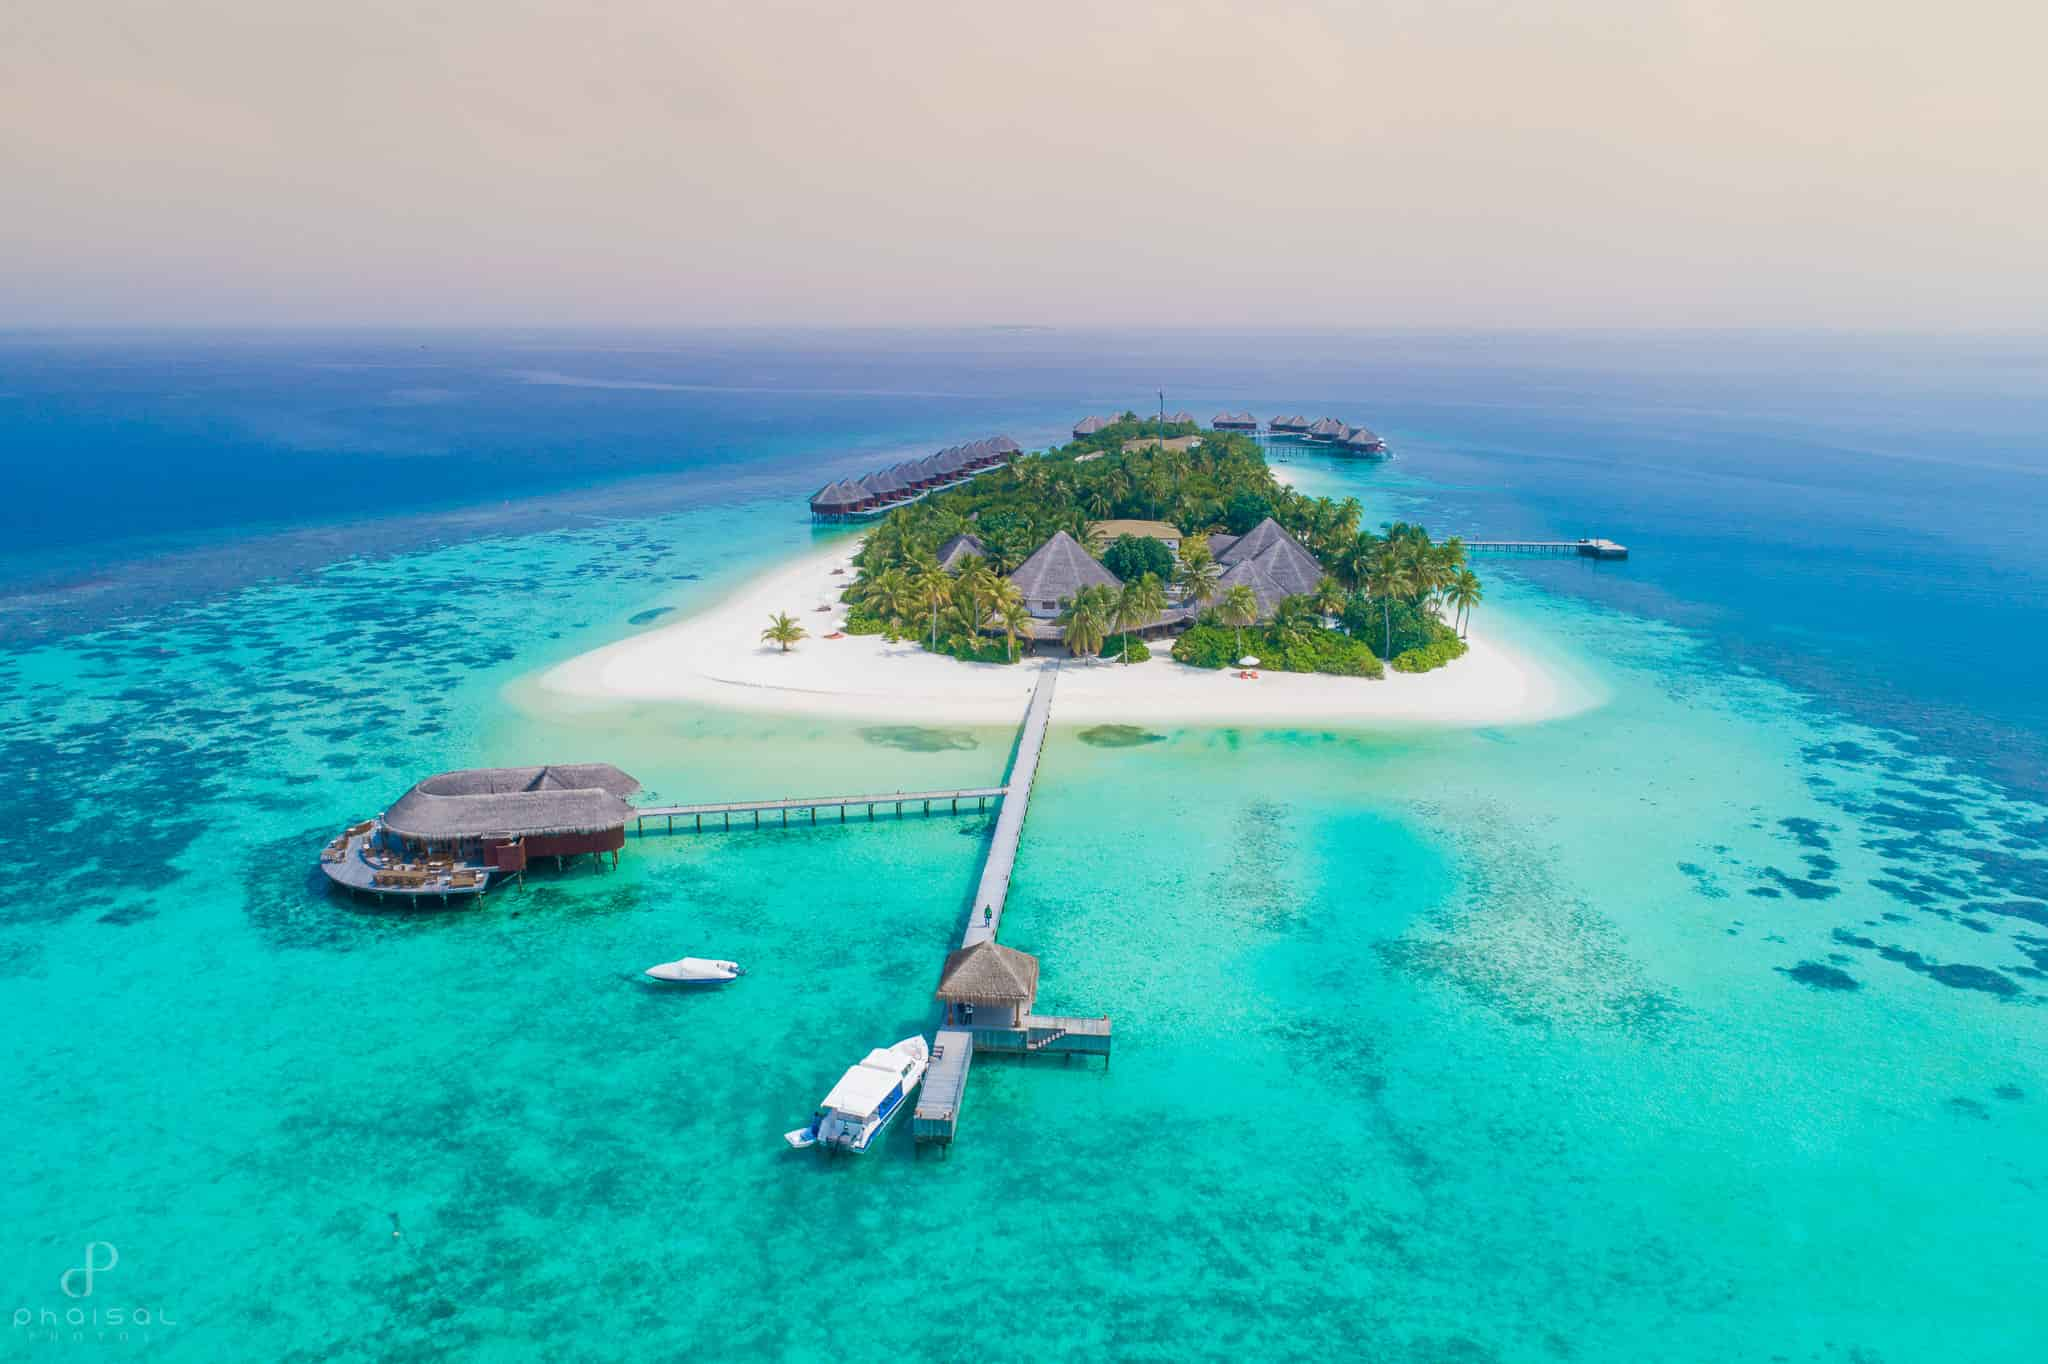 Mirihi Island Maldives - Maldives Travel Guide